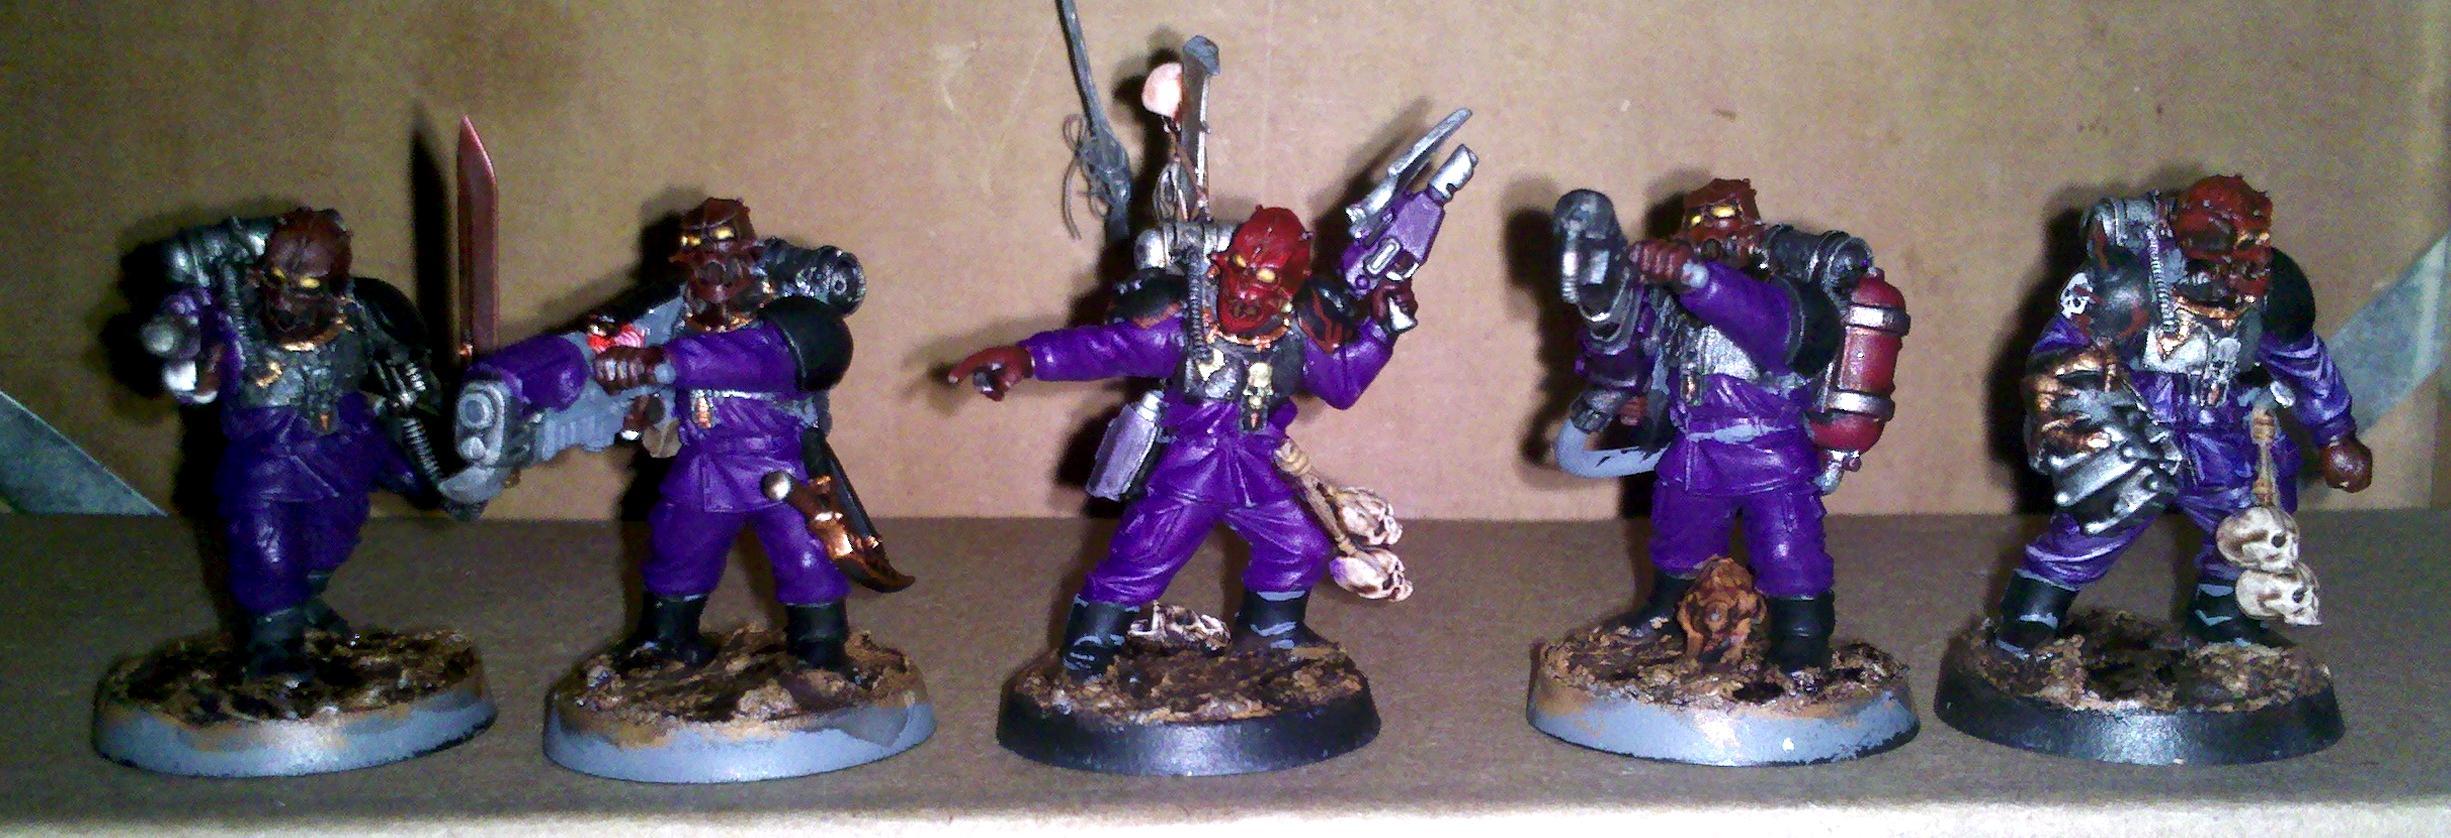 Grey Knights, Renegade Militia, Warhammer 40,000, Warrior Acolytes